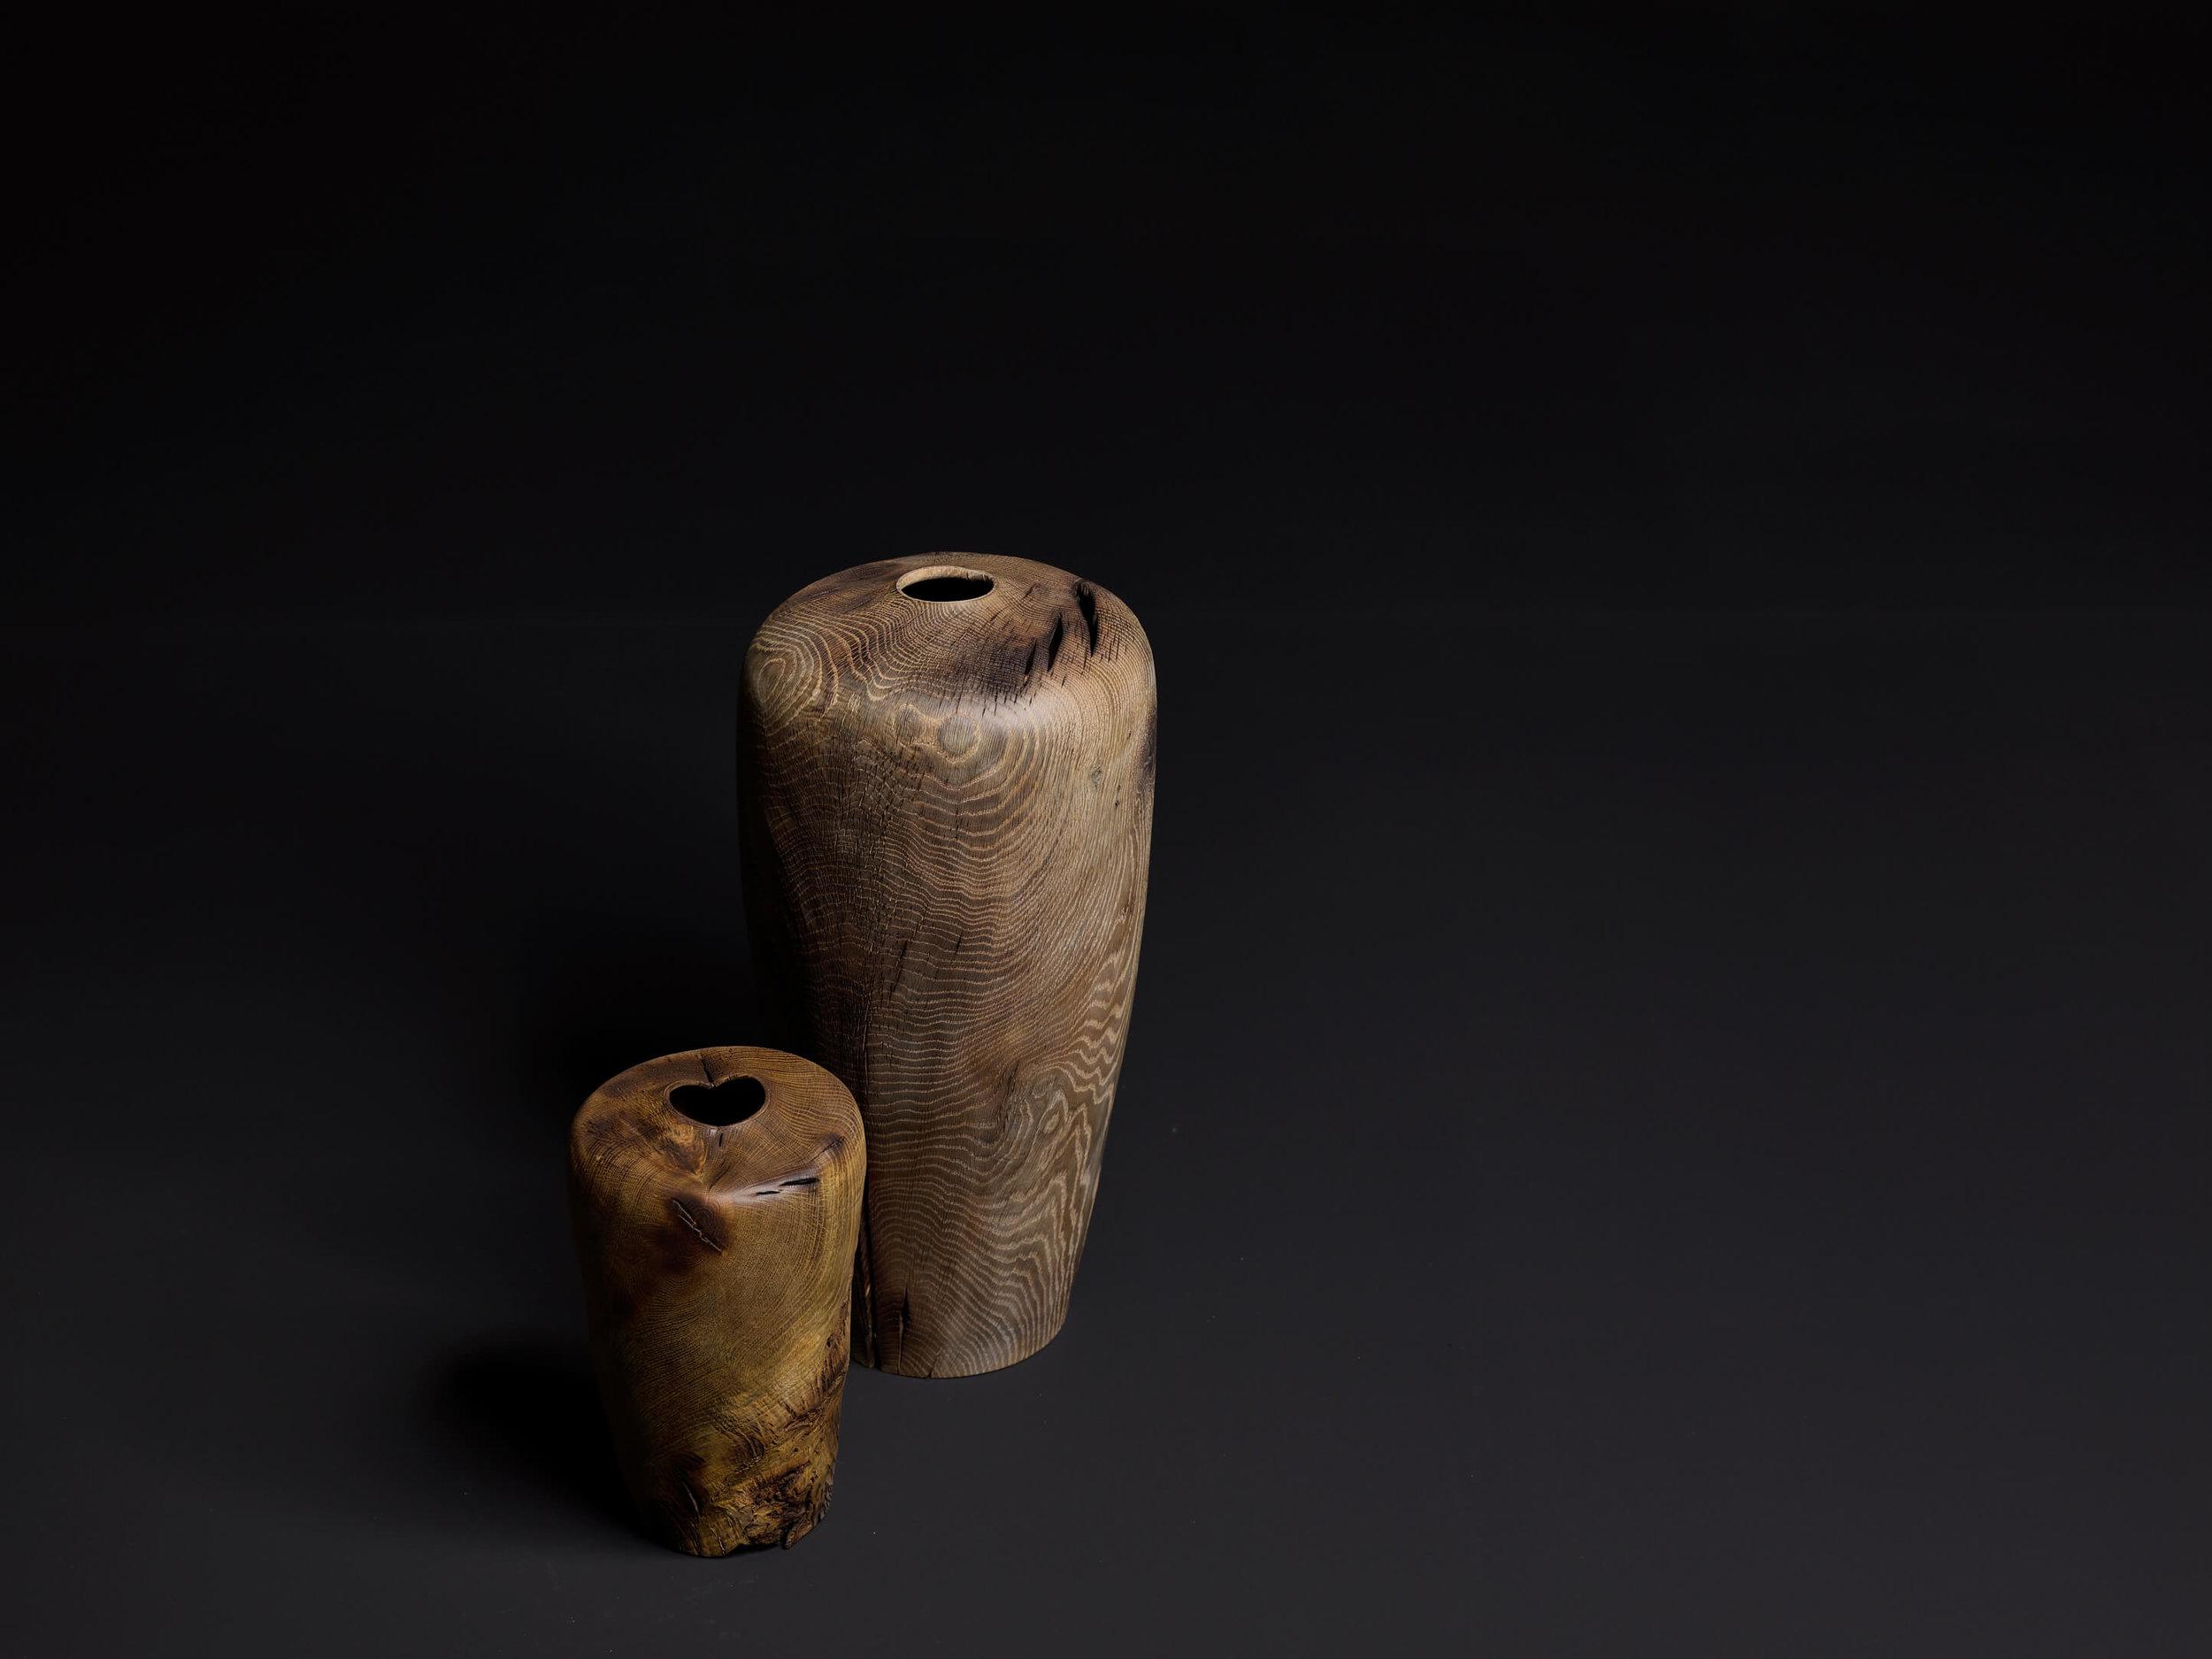 Ernst Gamperl,18/170 C17, 2017, Oak, 56 x 28 dia cm and 17/150 C17, 2017 Oak, 33 x 20 dia cm Photo: Bernhard Spöttel